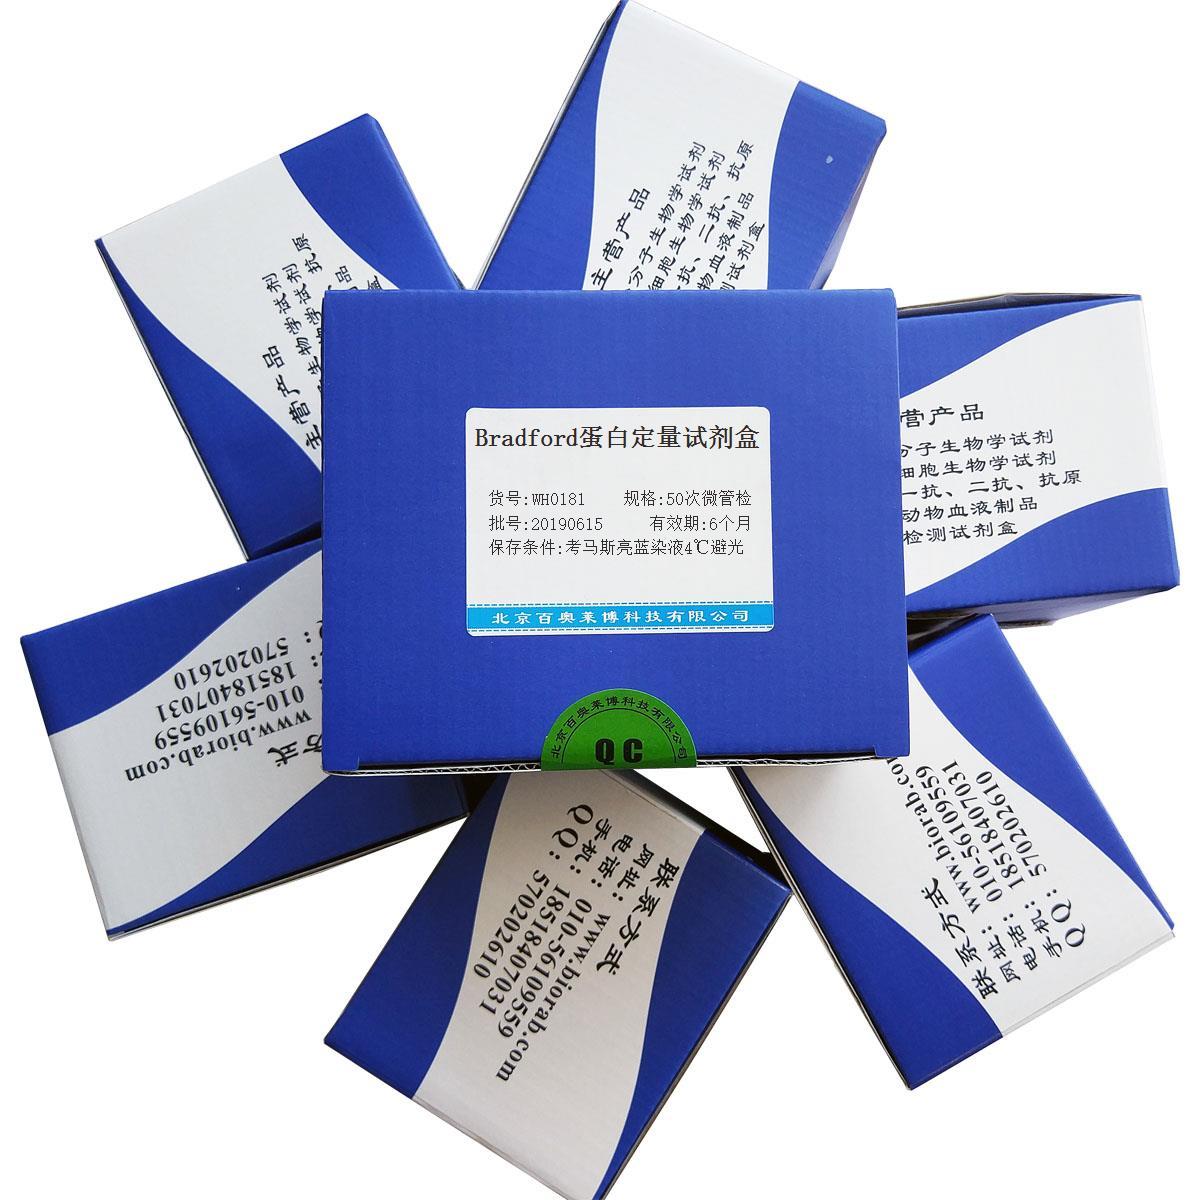 Bradford蛋白定量试剂盒北京现货